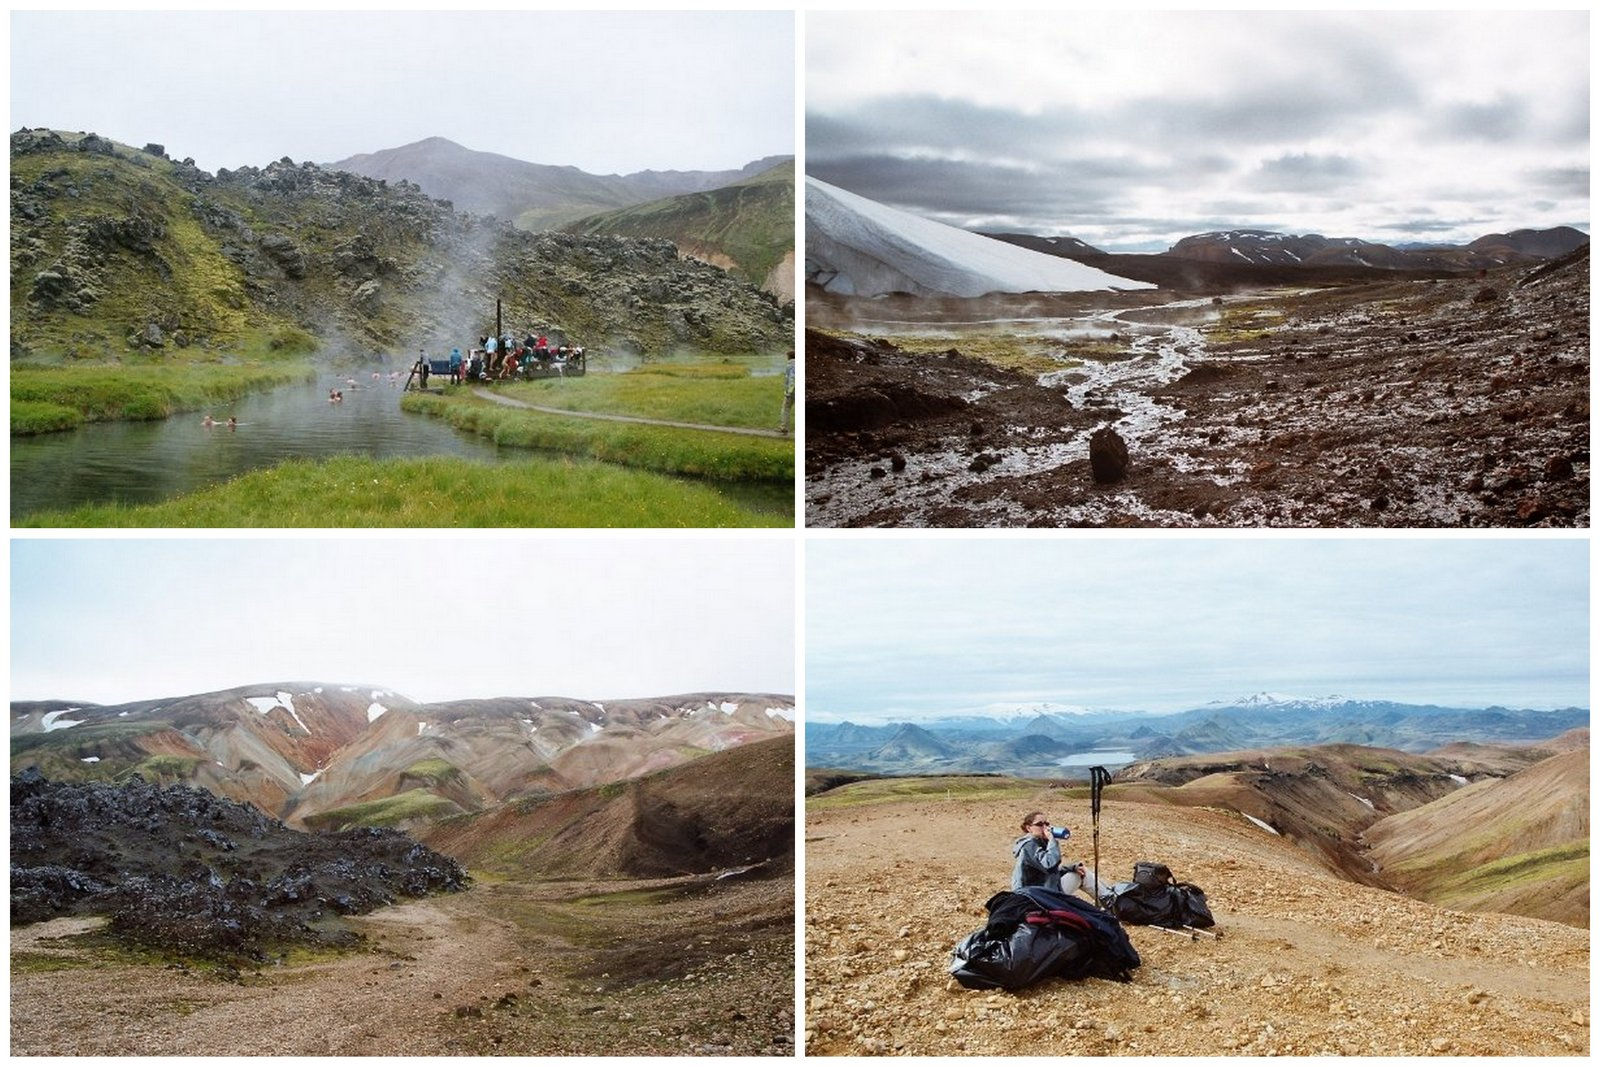 islande-trek-laukavegur